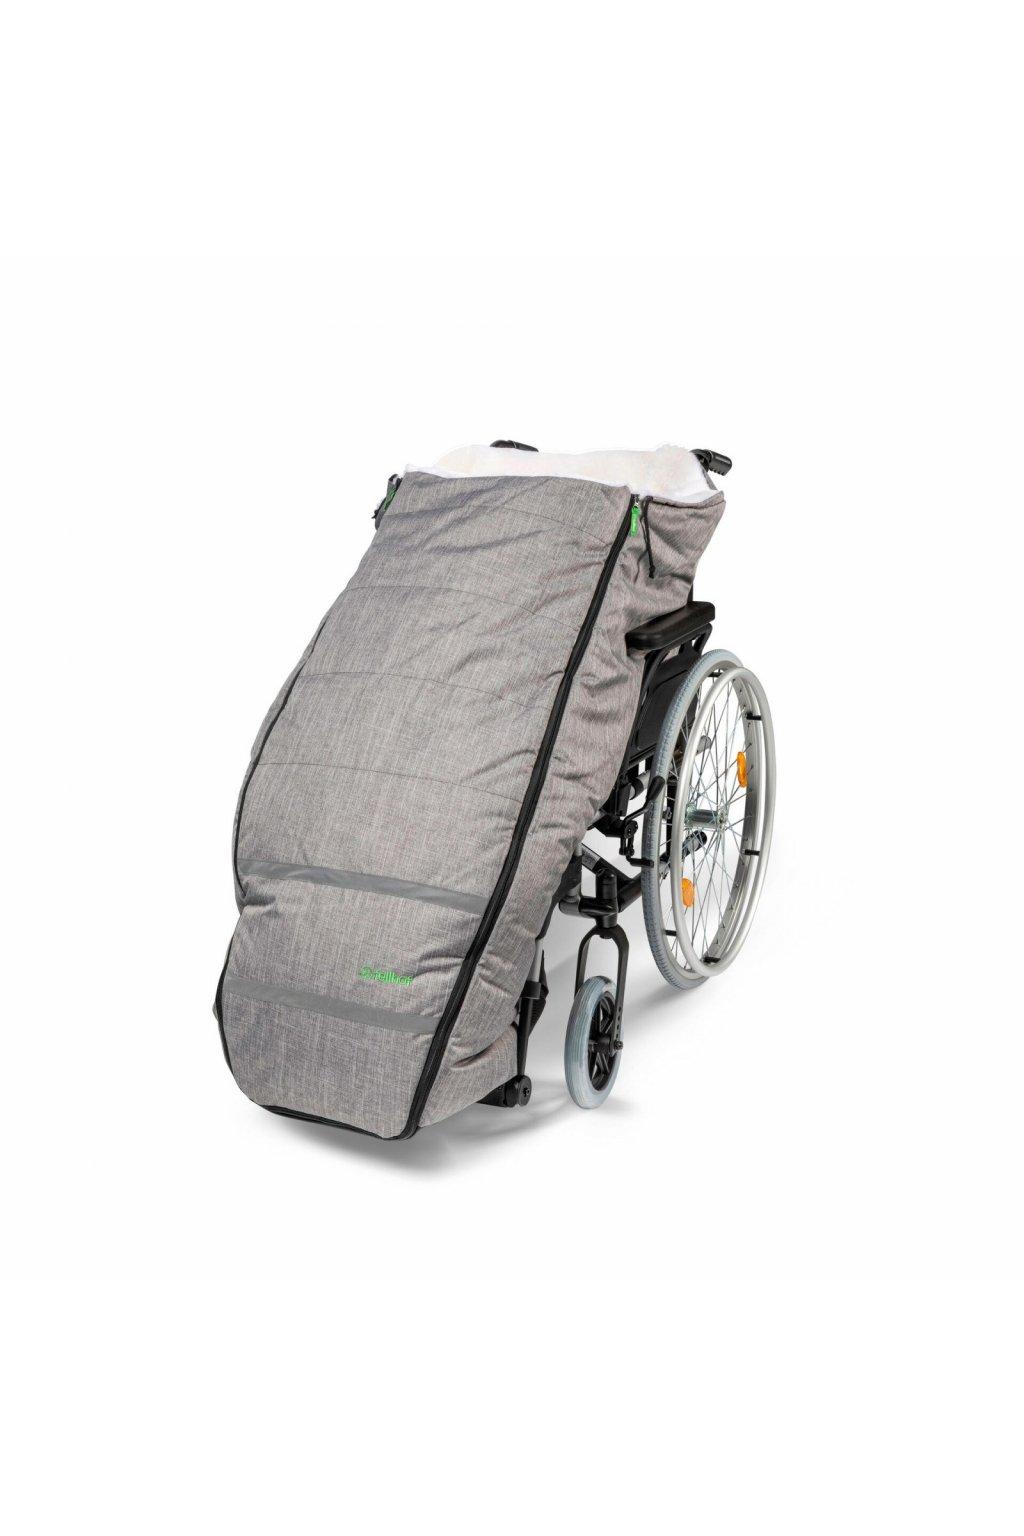 Rollstuhl Schlüpfsack mit Lammfell black melange 5